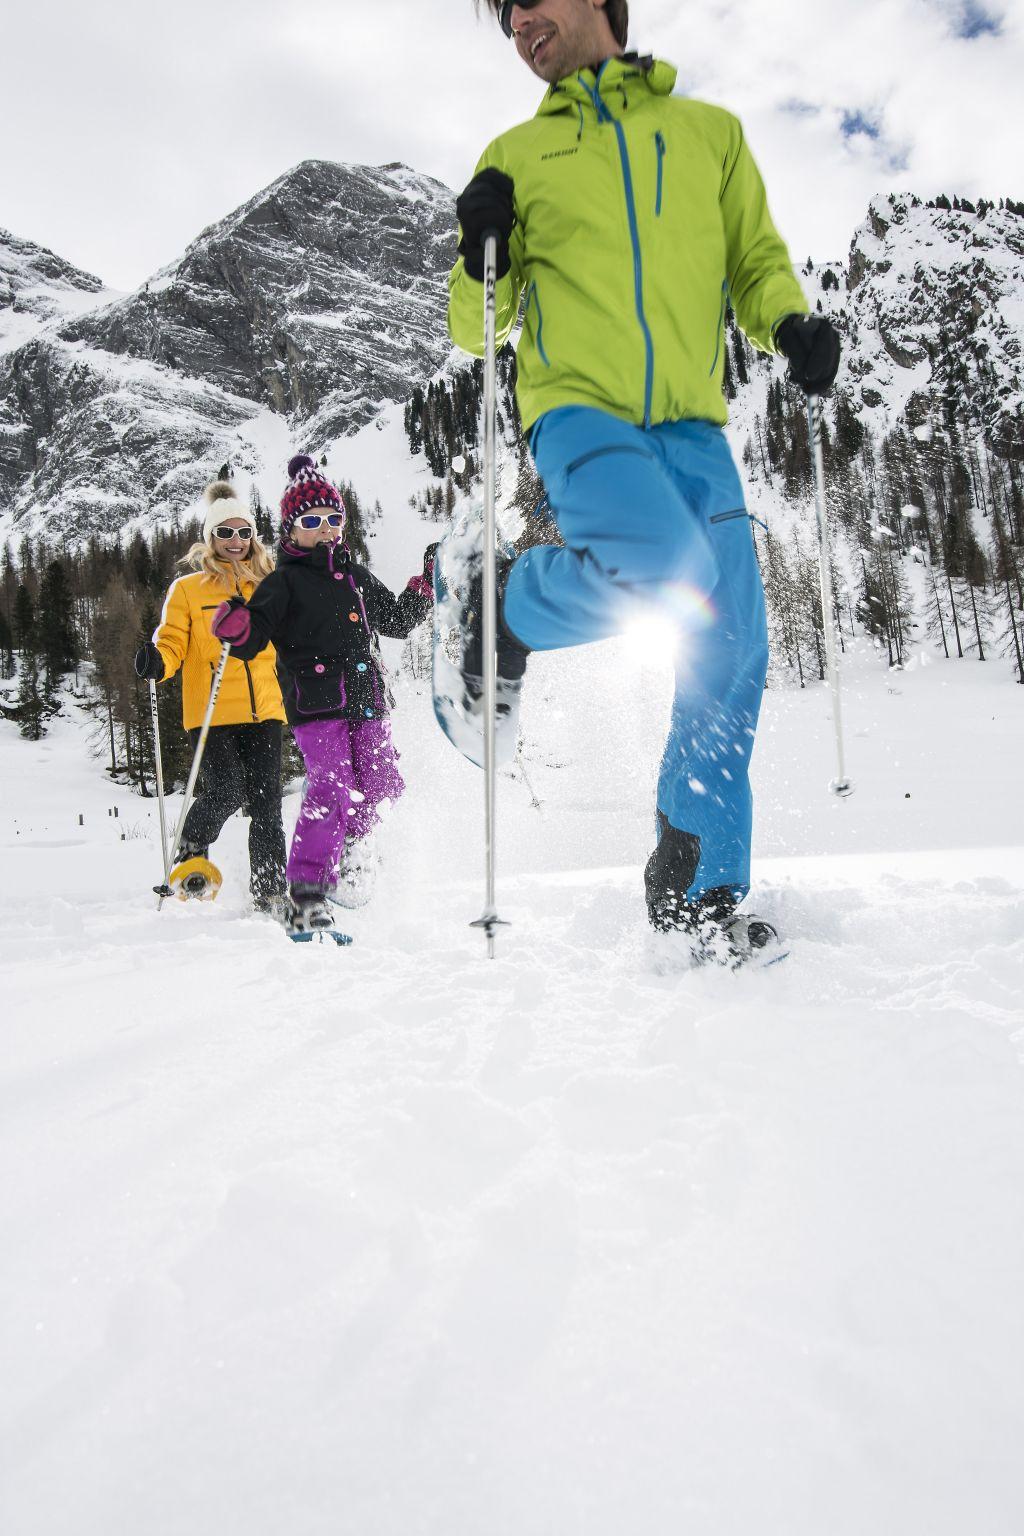 Familie beim Schneeschuhwandern (c) shootandstyle.com (Tux-Finkenberg)